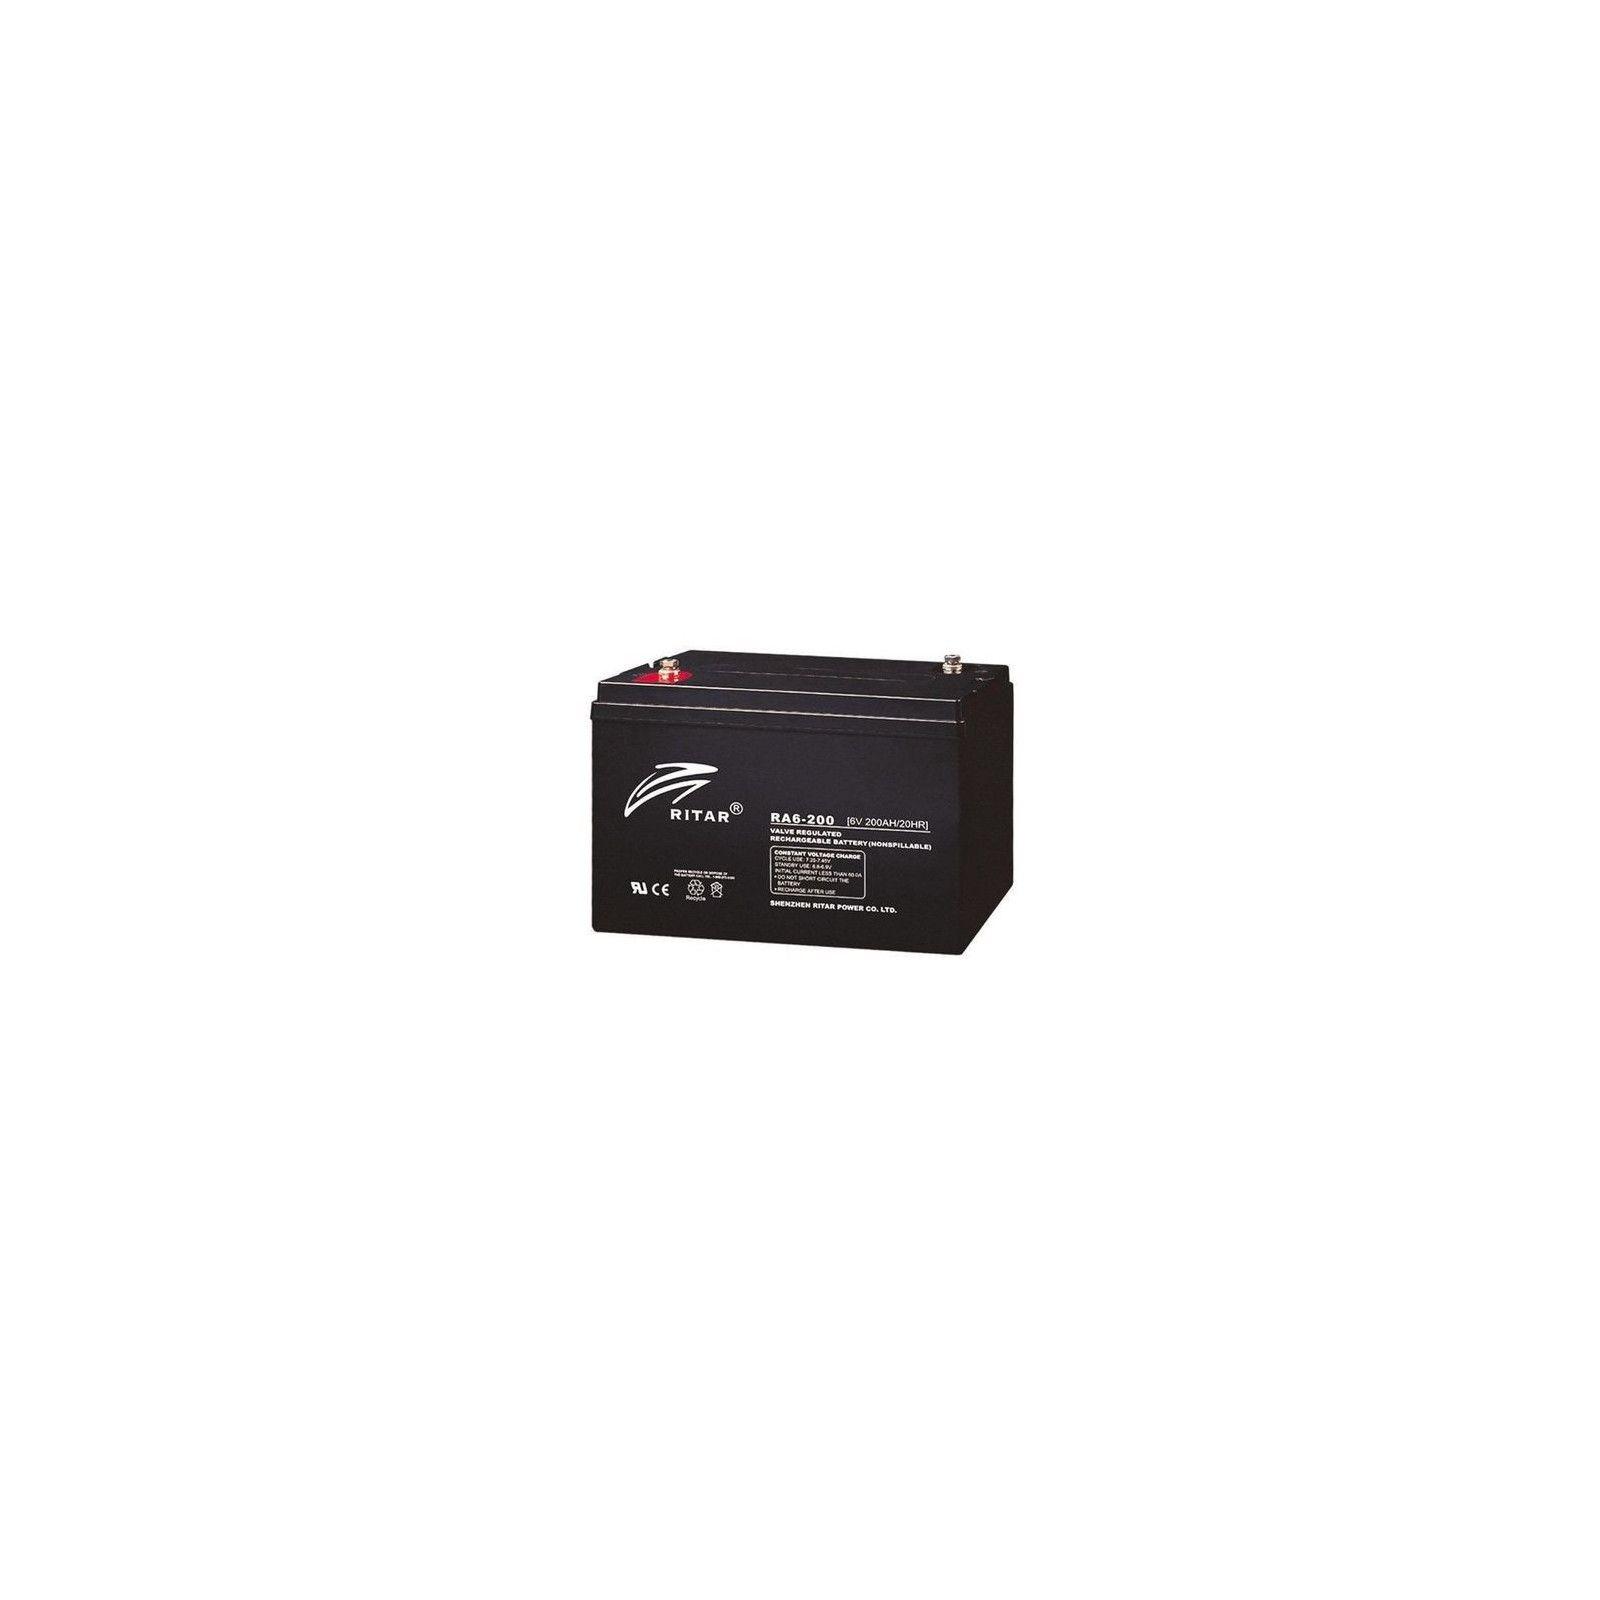 Battery Ritar RA6-200 212Ah 6V Ra RITAR - 1